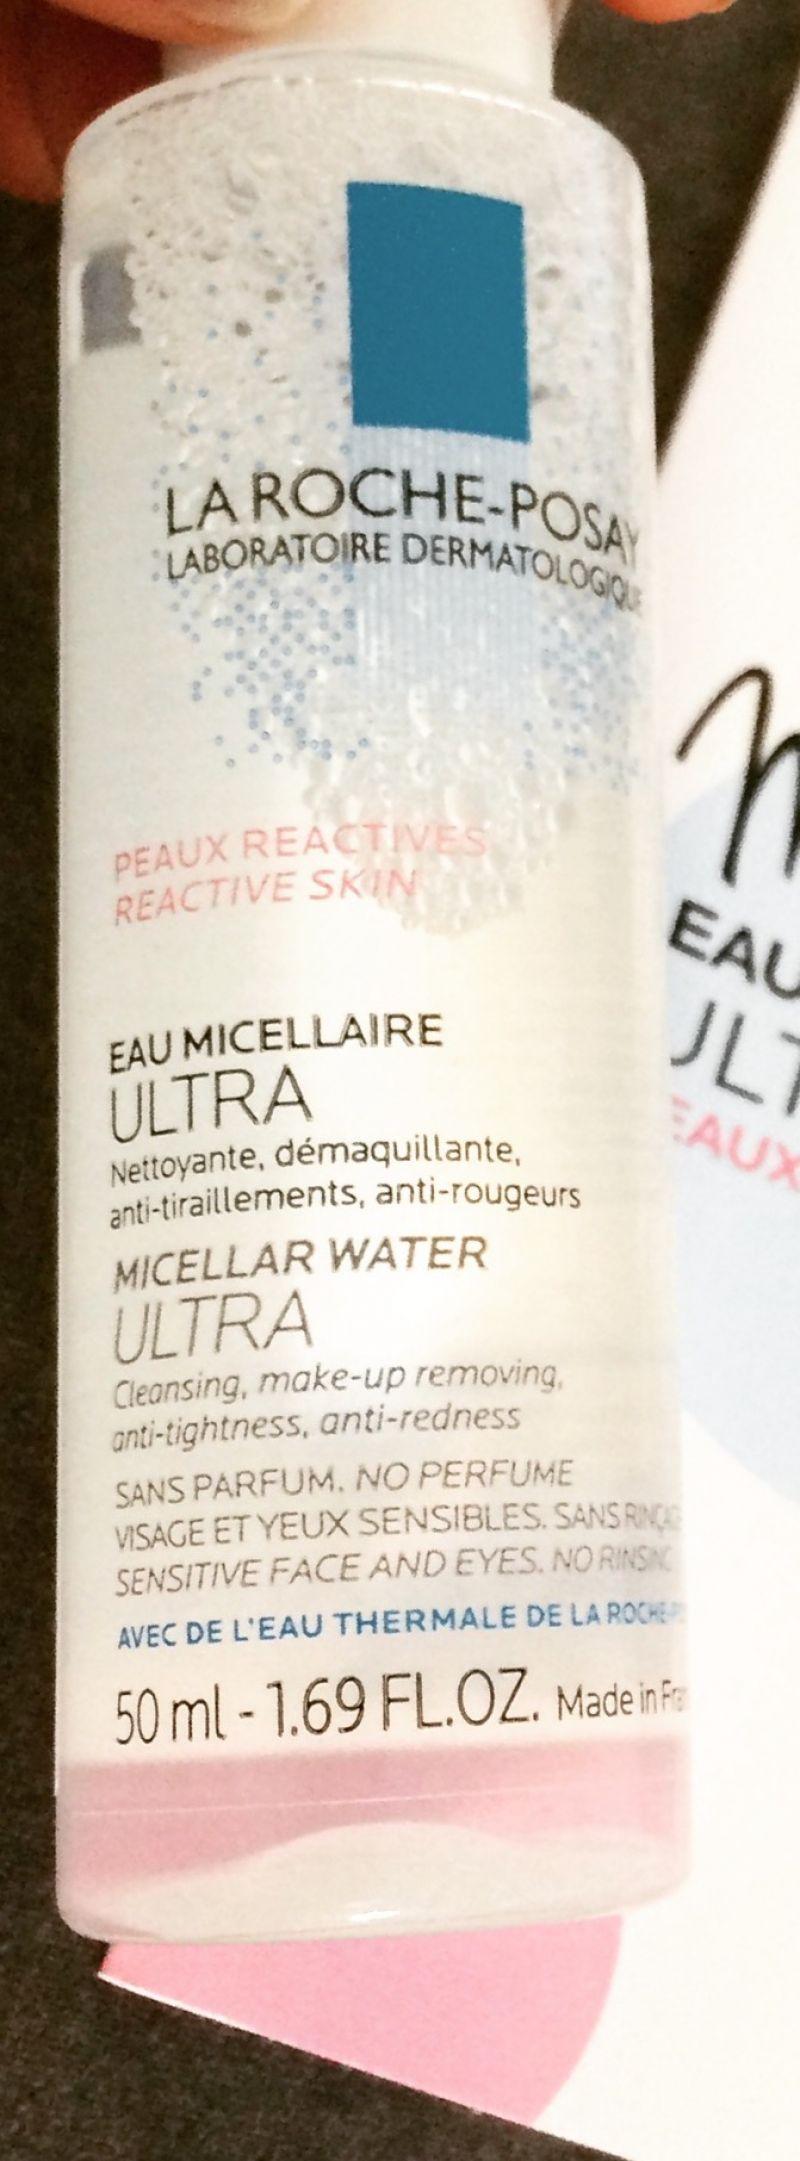 Swatch Effaclar Eau Micellaire Purifiante 200 ml, La Roche-Posay